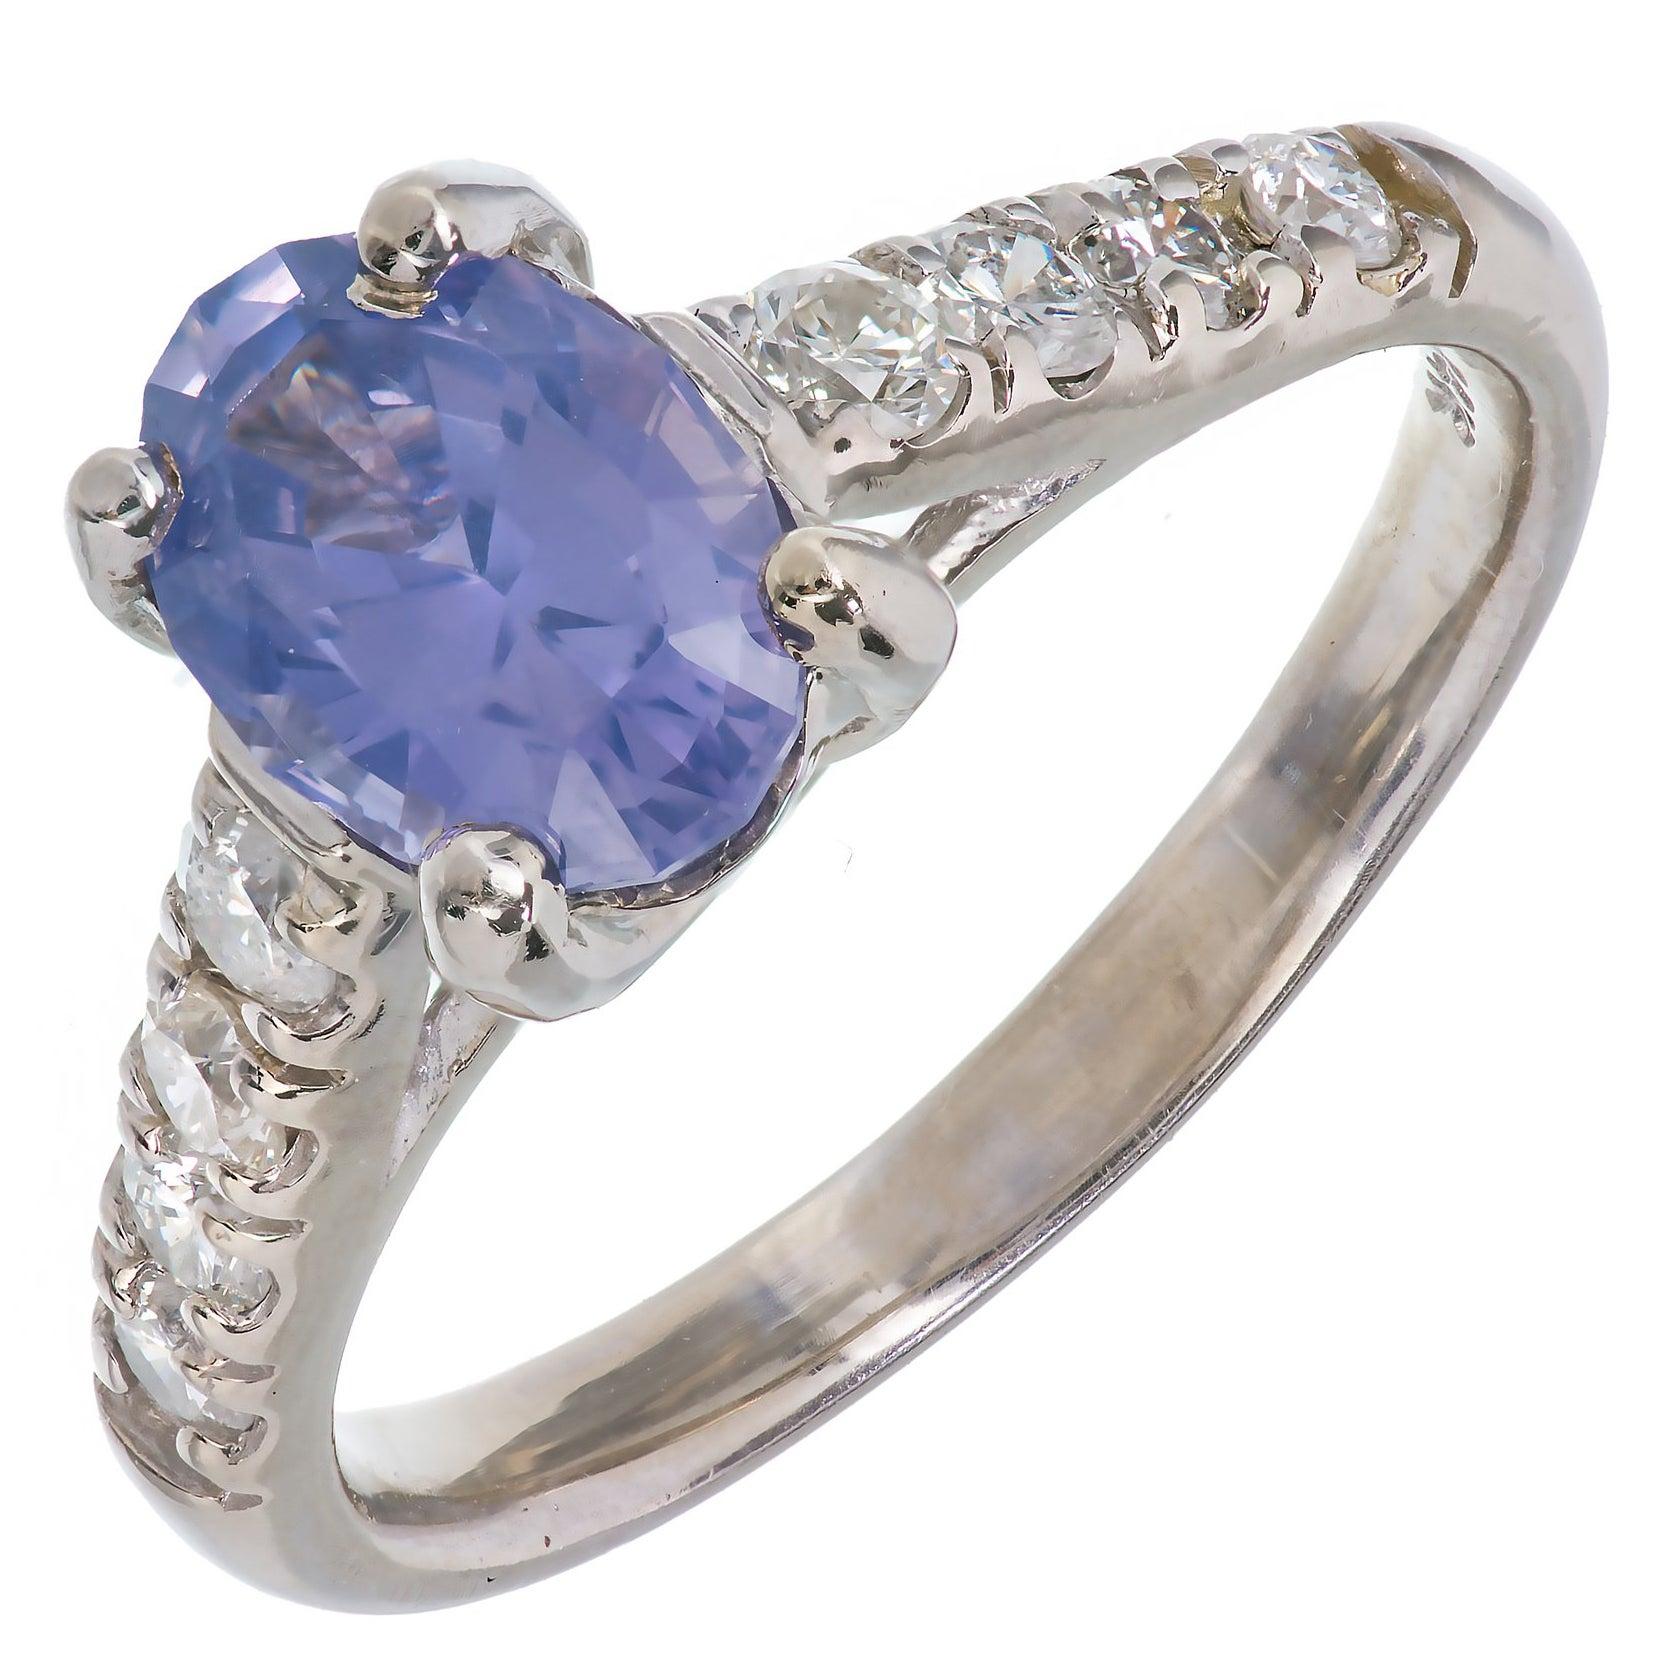 Peter Suchy 1.60 Carat Blue Violet Sapphire Diamond Platinum Engagement Ring